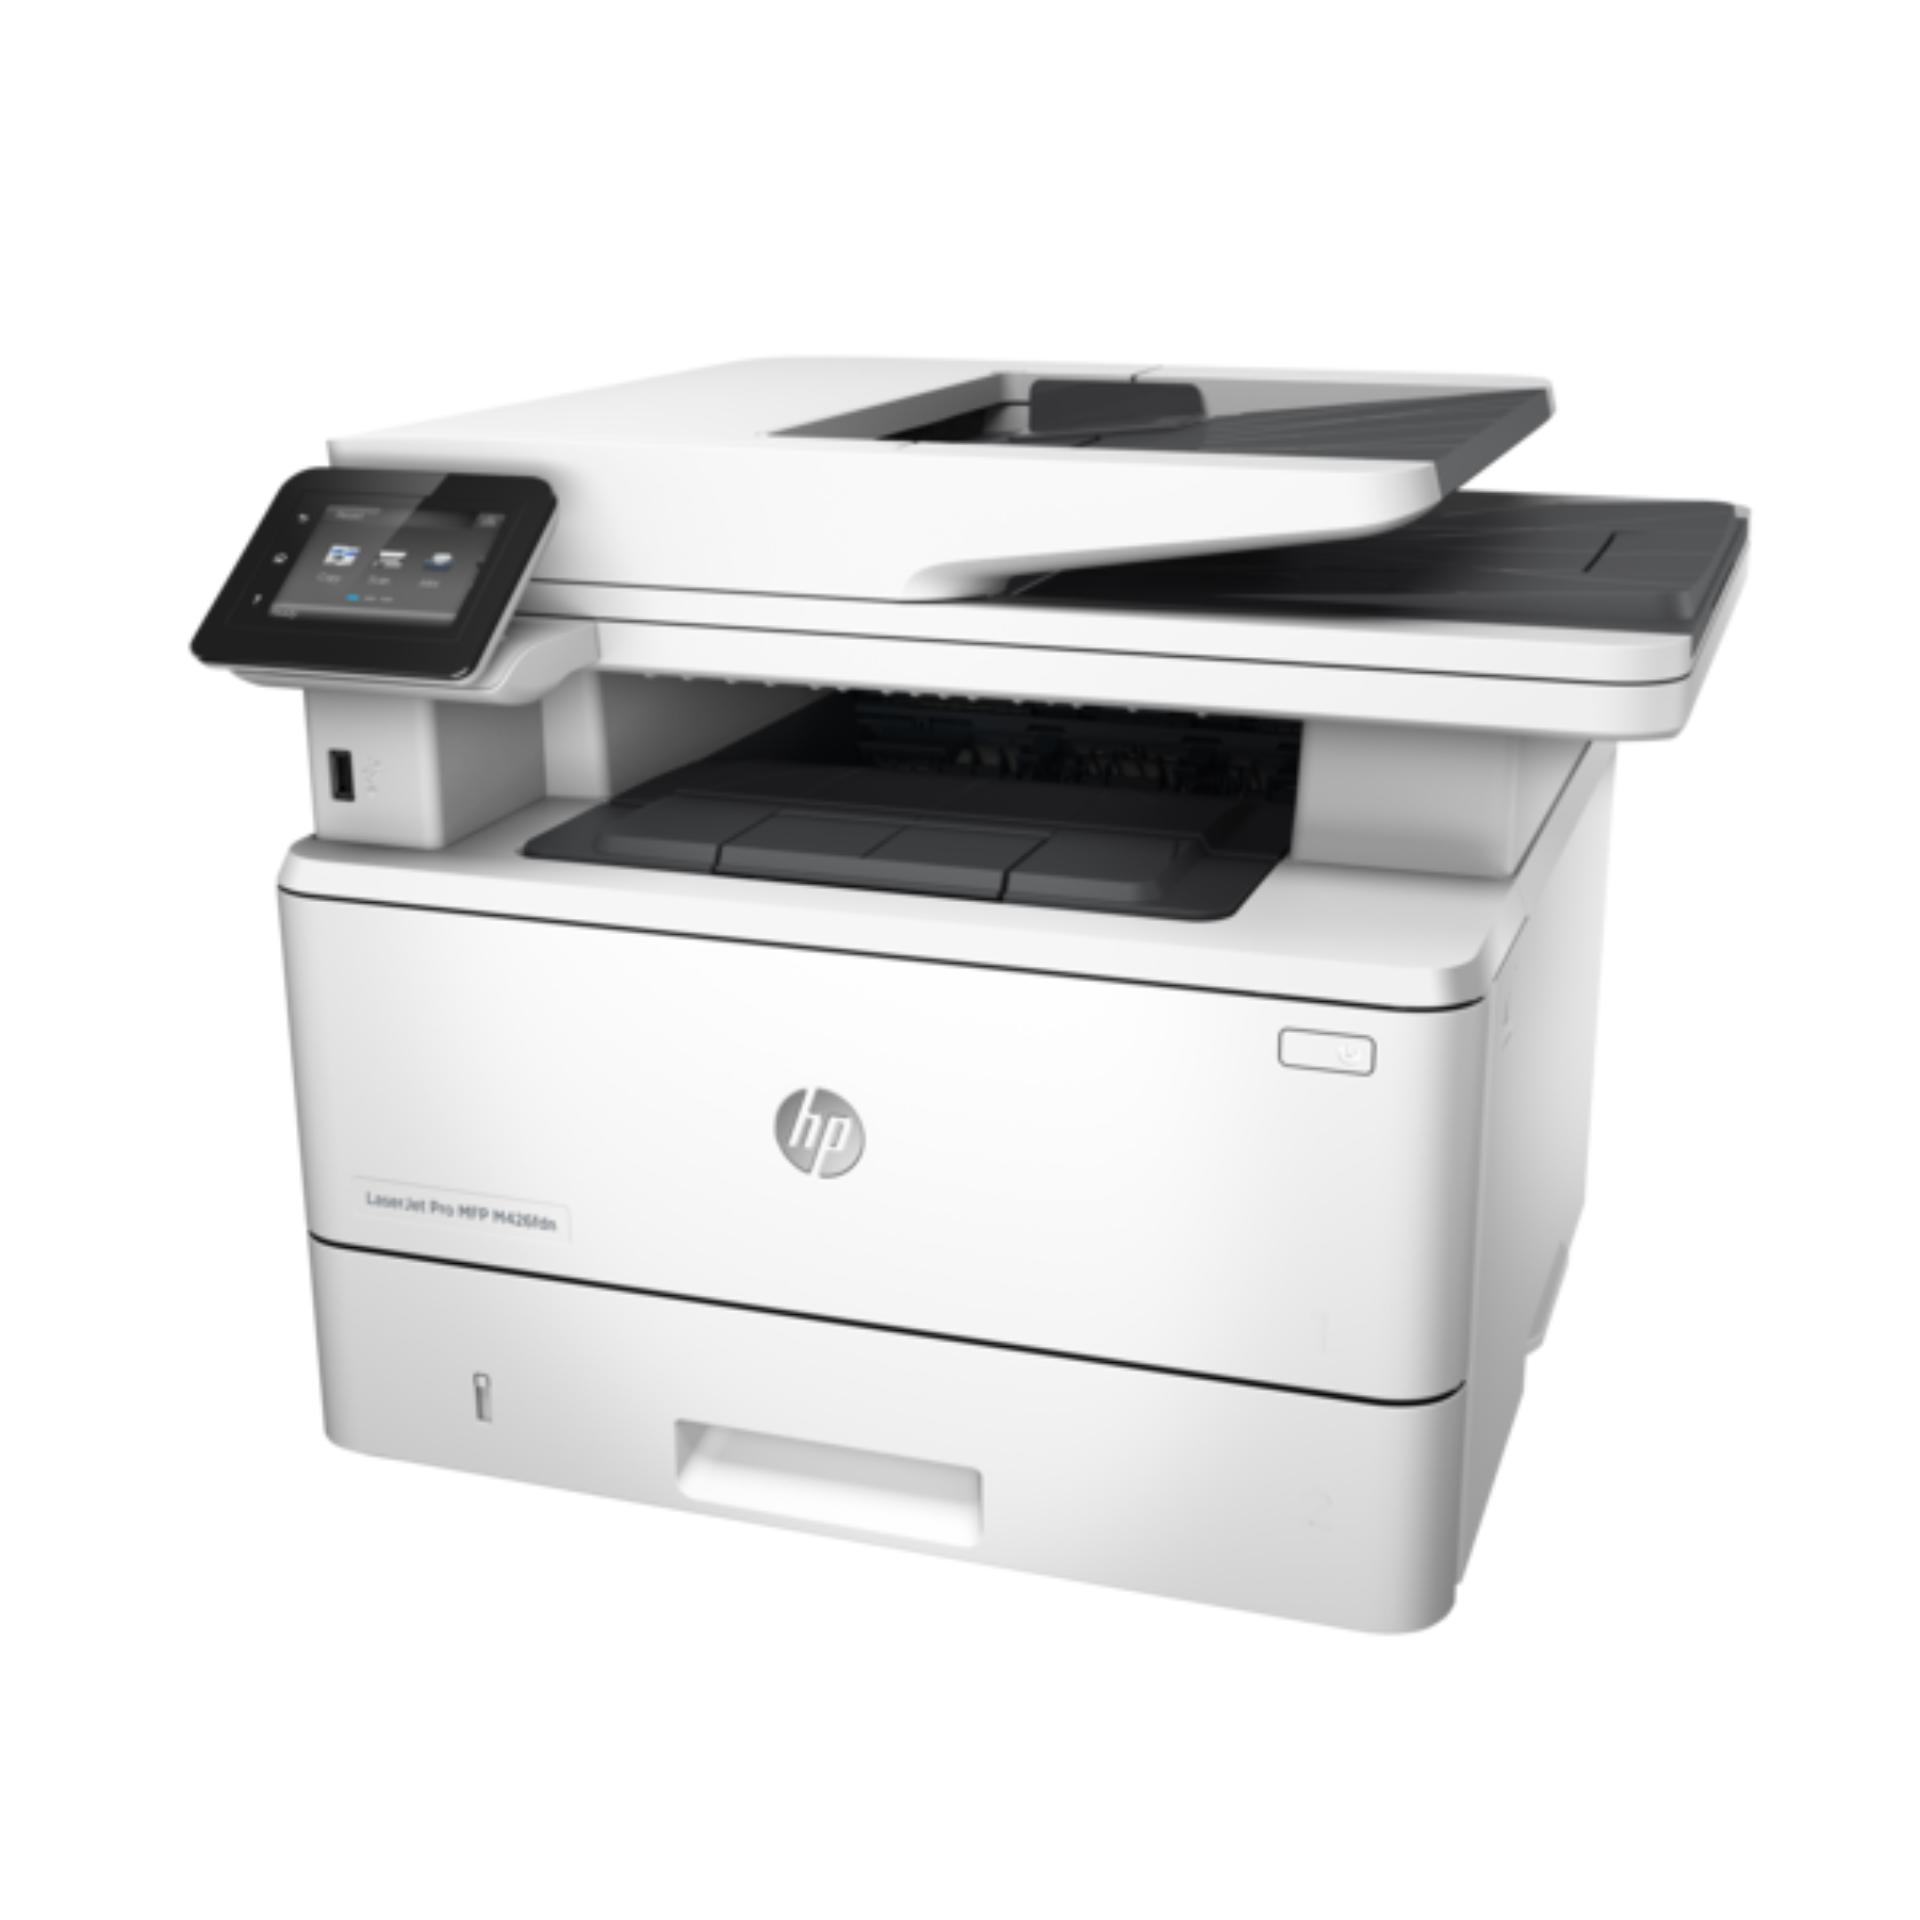 HP LaserJet Pro MFP M426fdn+Free 1 Ream Print Paper .